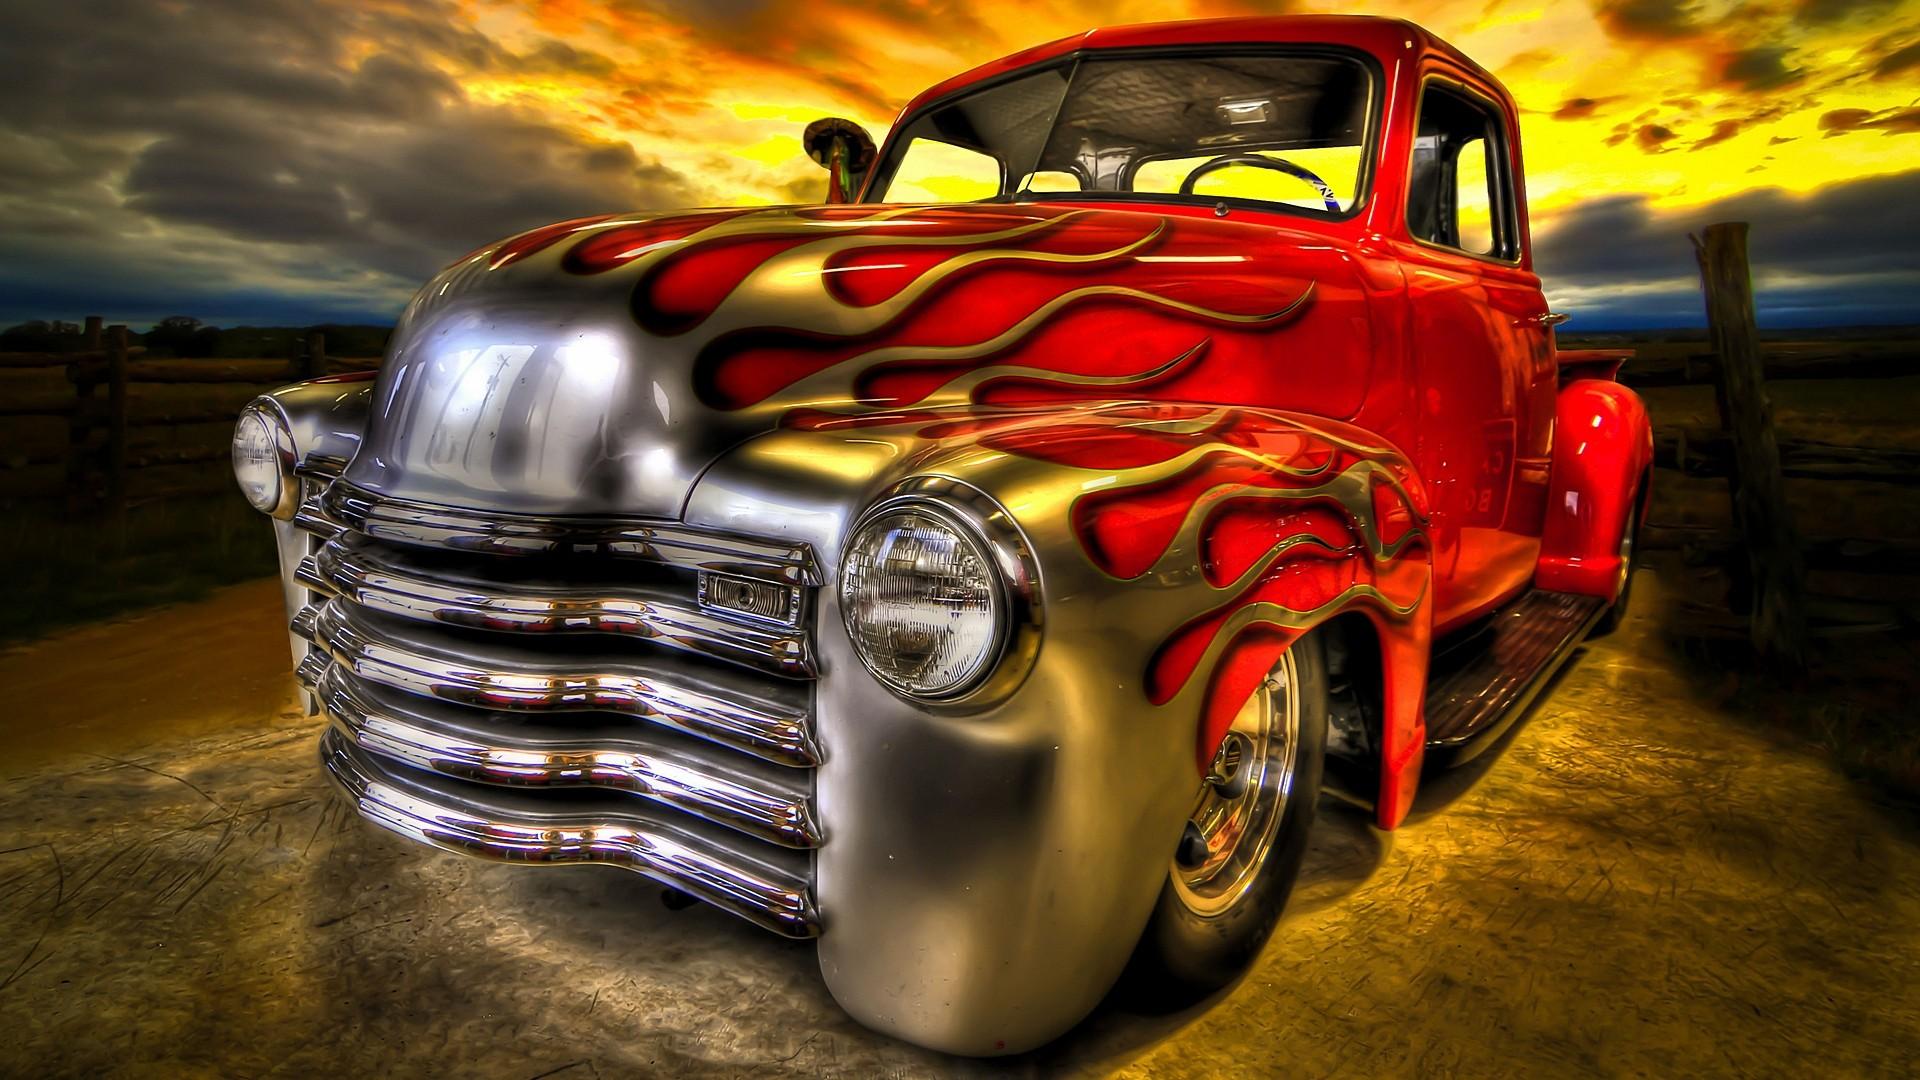 1955 Chevy 3100. [Desktop wallpaper 1600×1200]   Trucks Etc. Desktop Wp's    Pinterest   Chevy, Classic chevy trucks and Cars